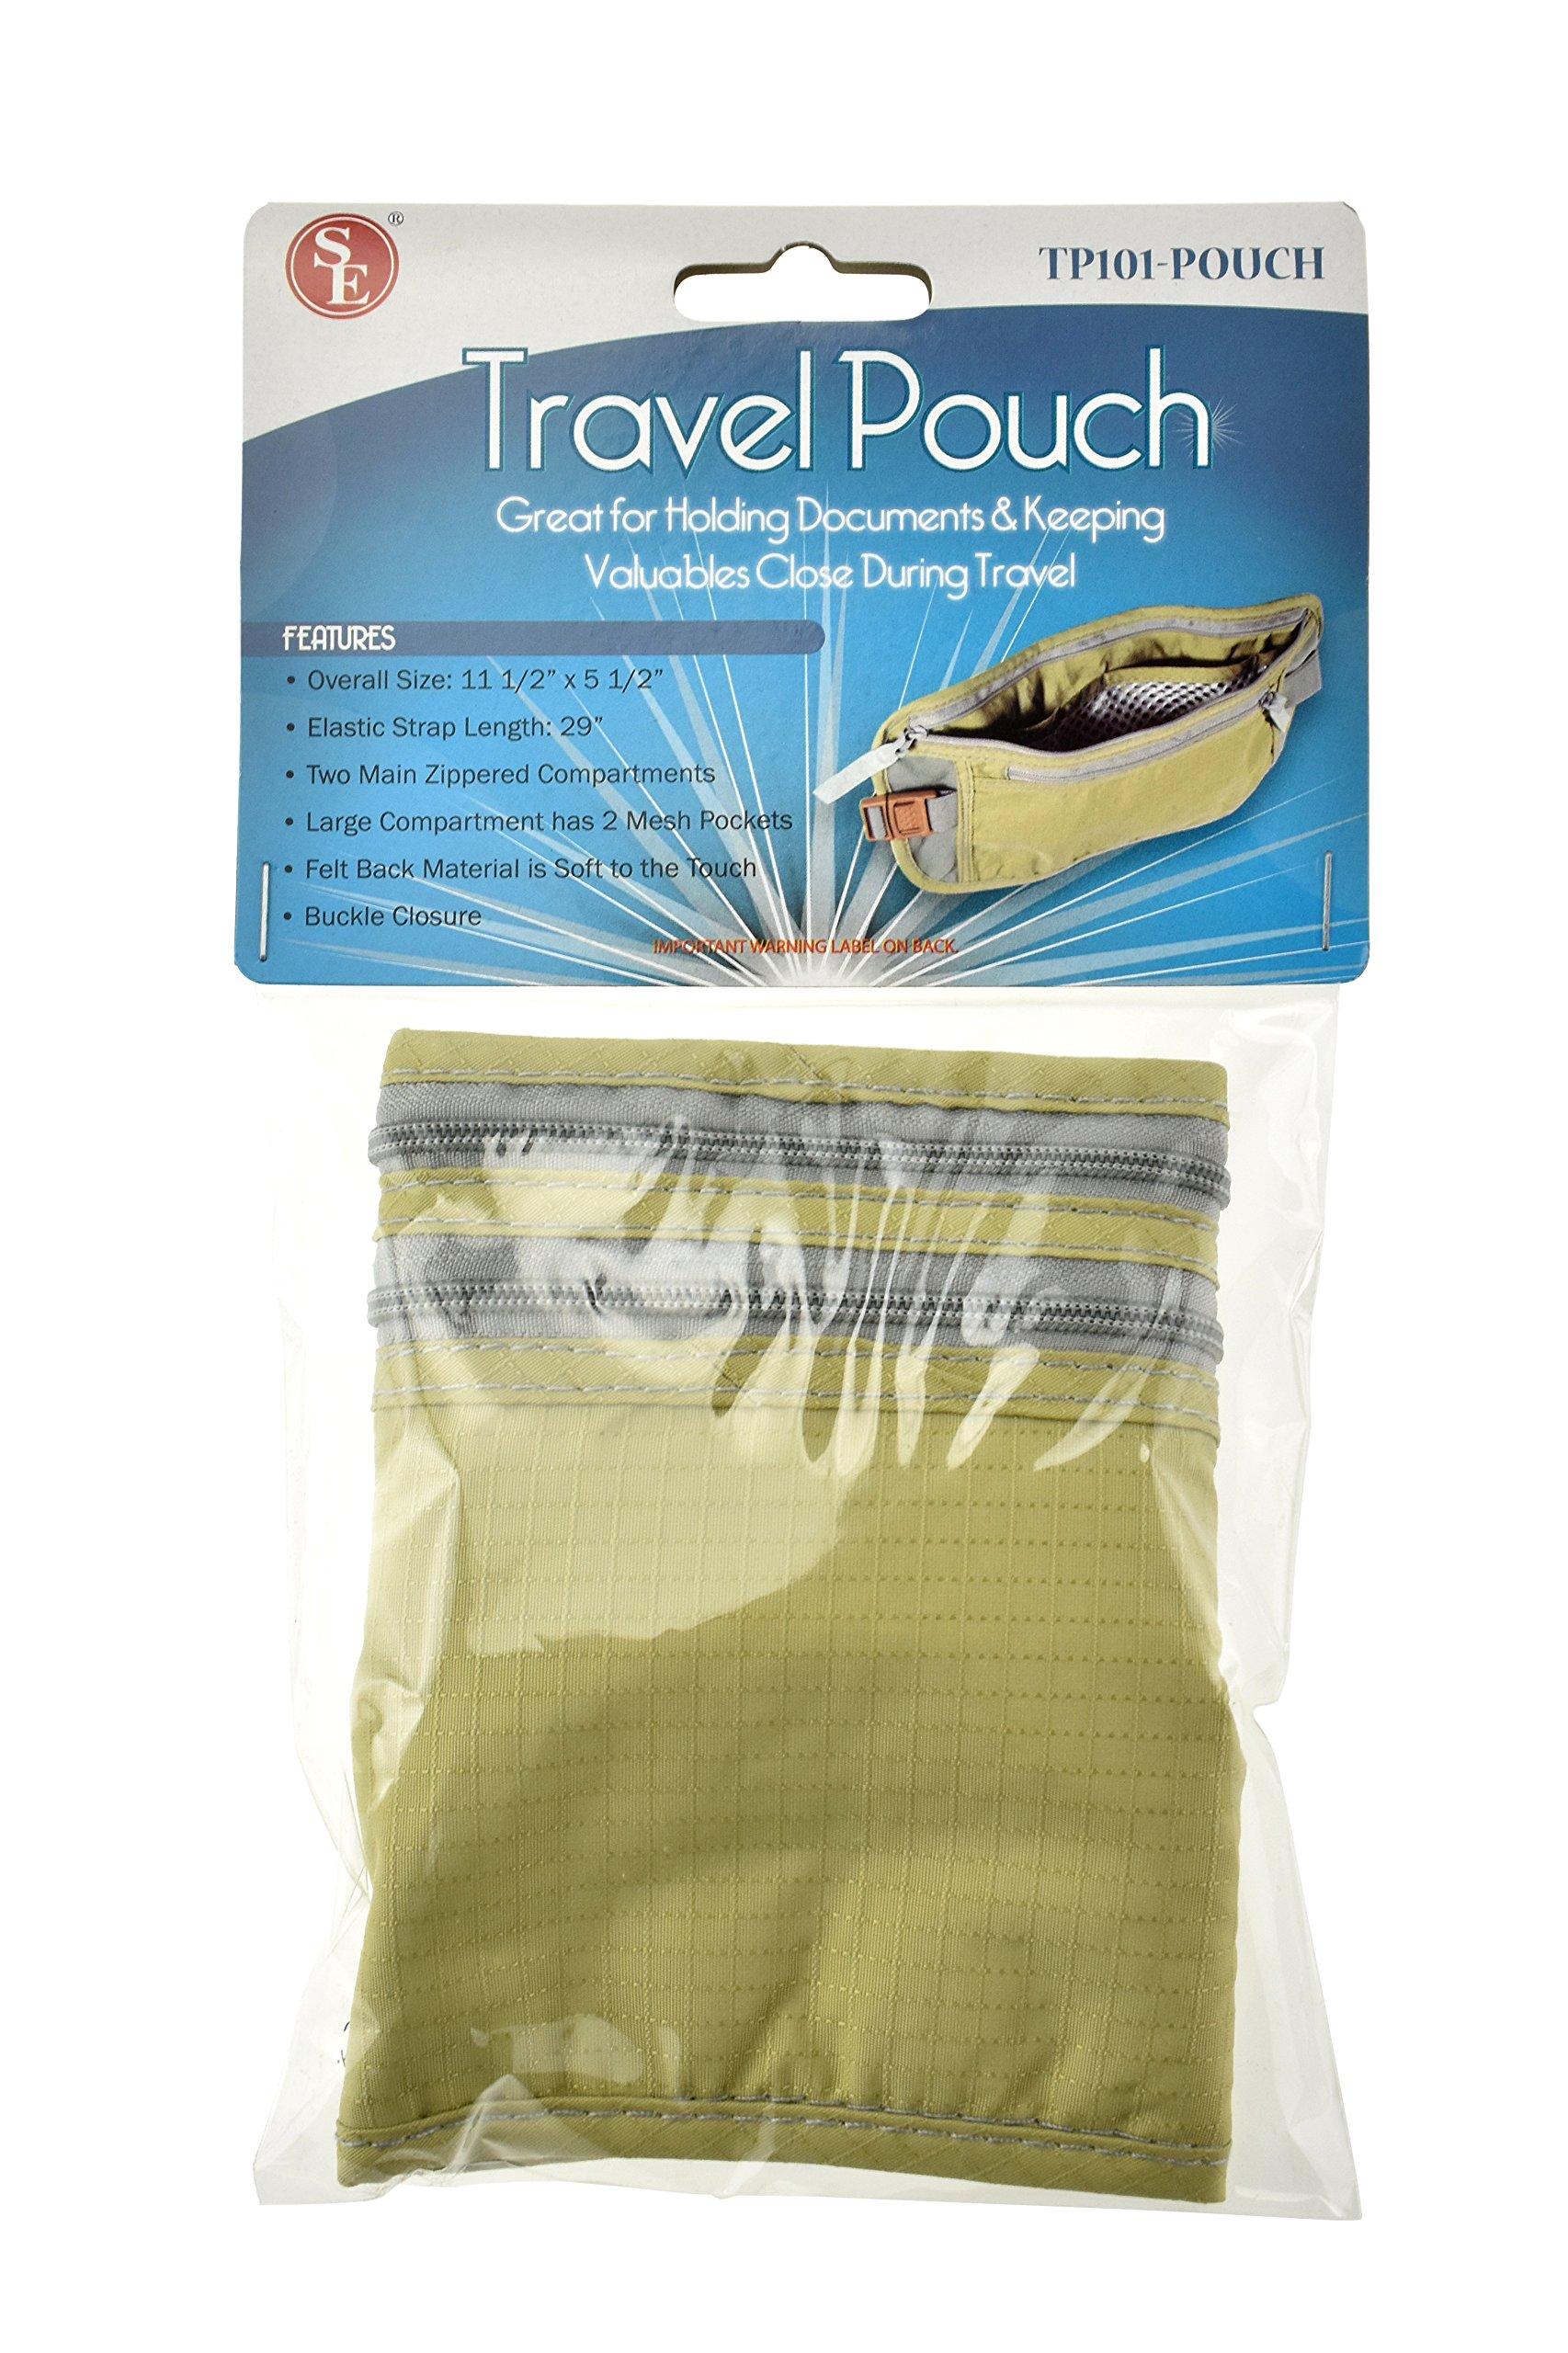 SE TP101-POUCH Concealed Dual Zipper Travel Pouch by SE (Image #7)